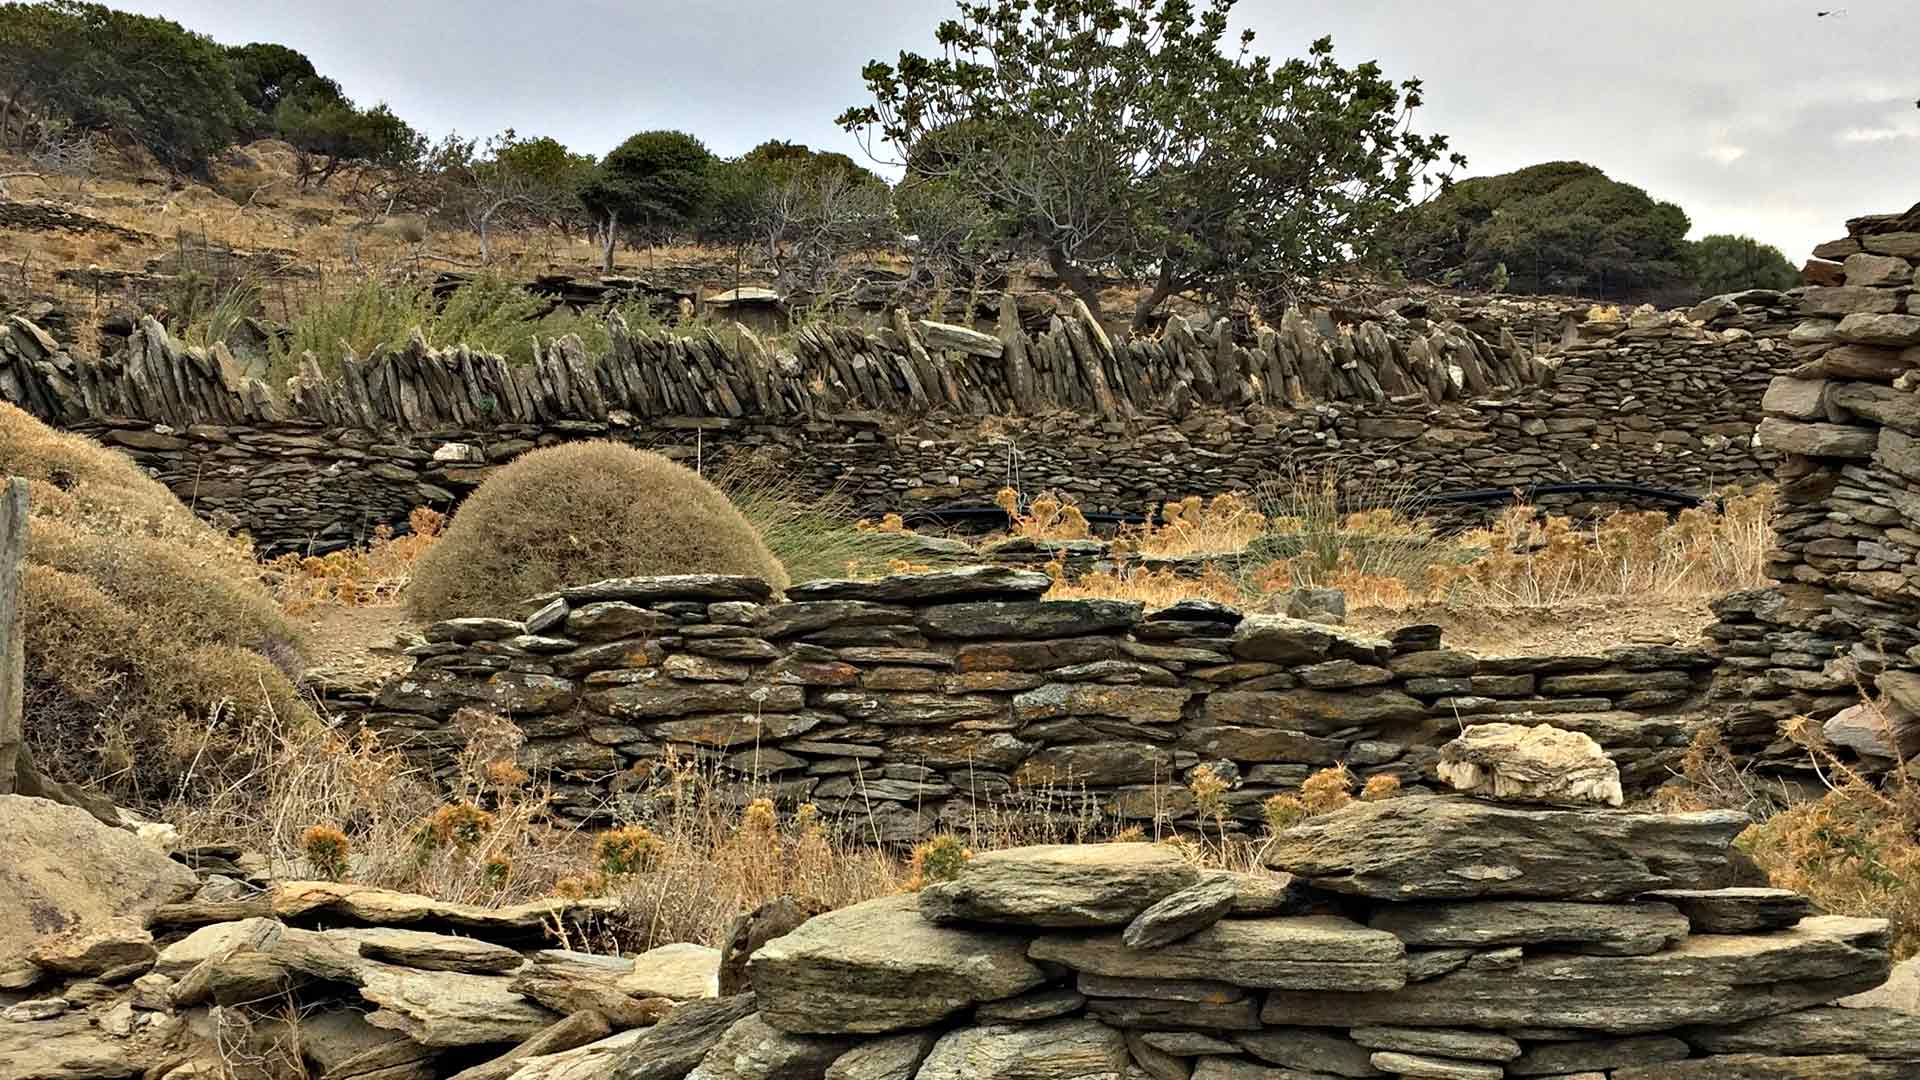 Kivimuurein ympäröidyt vaellusreitit